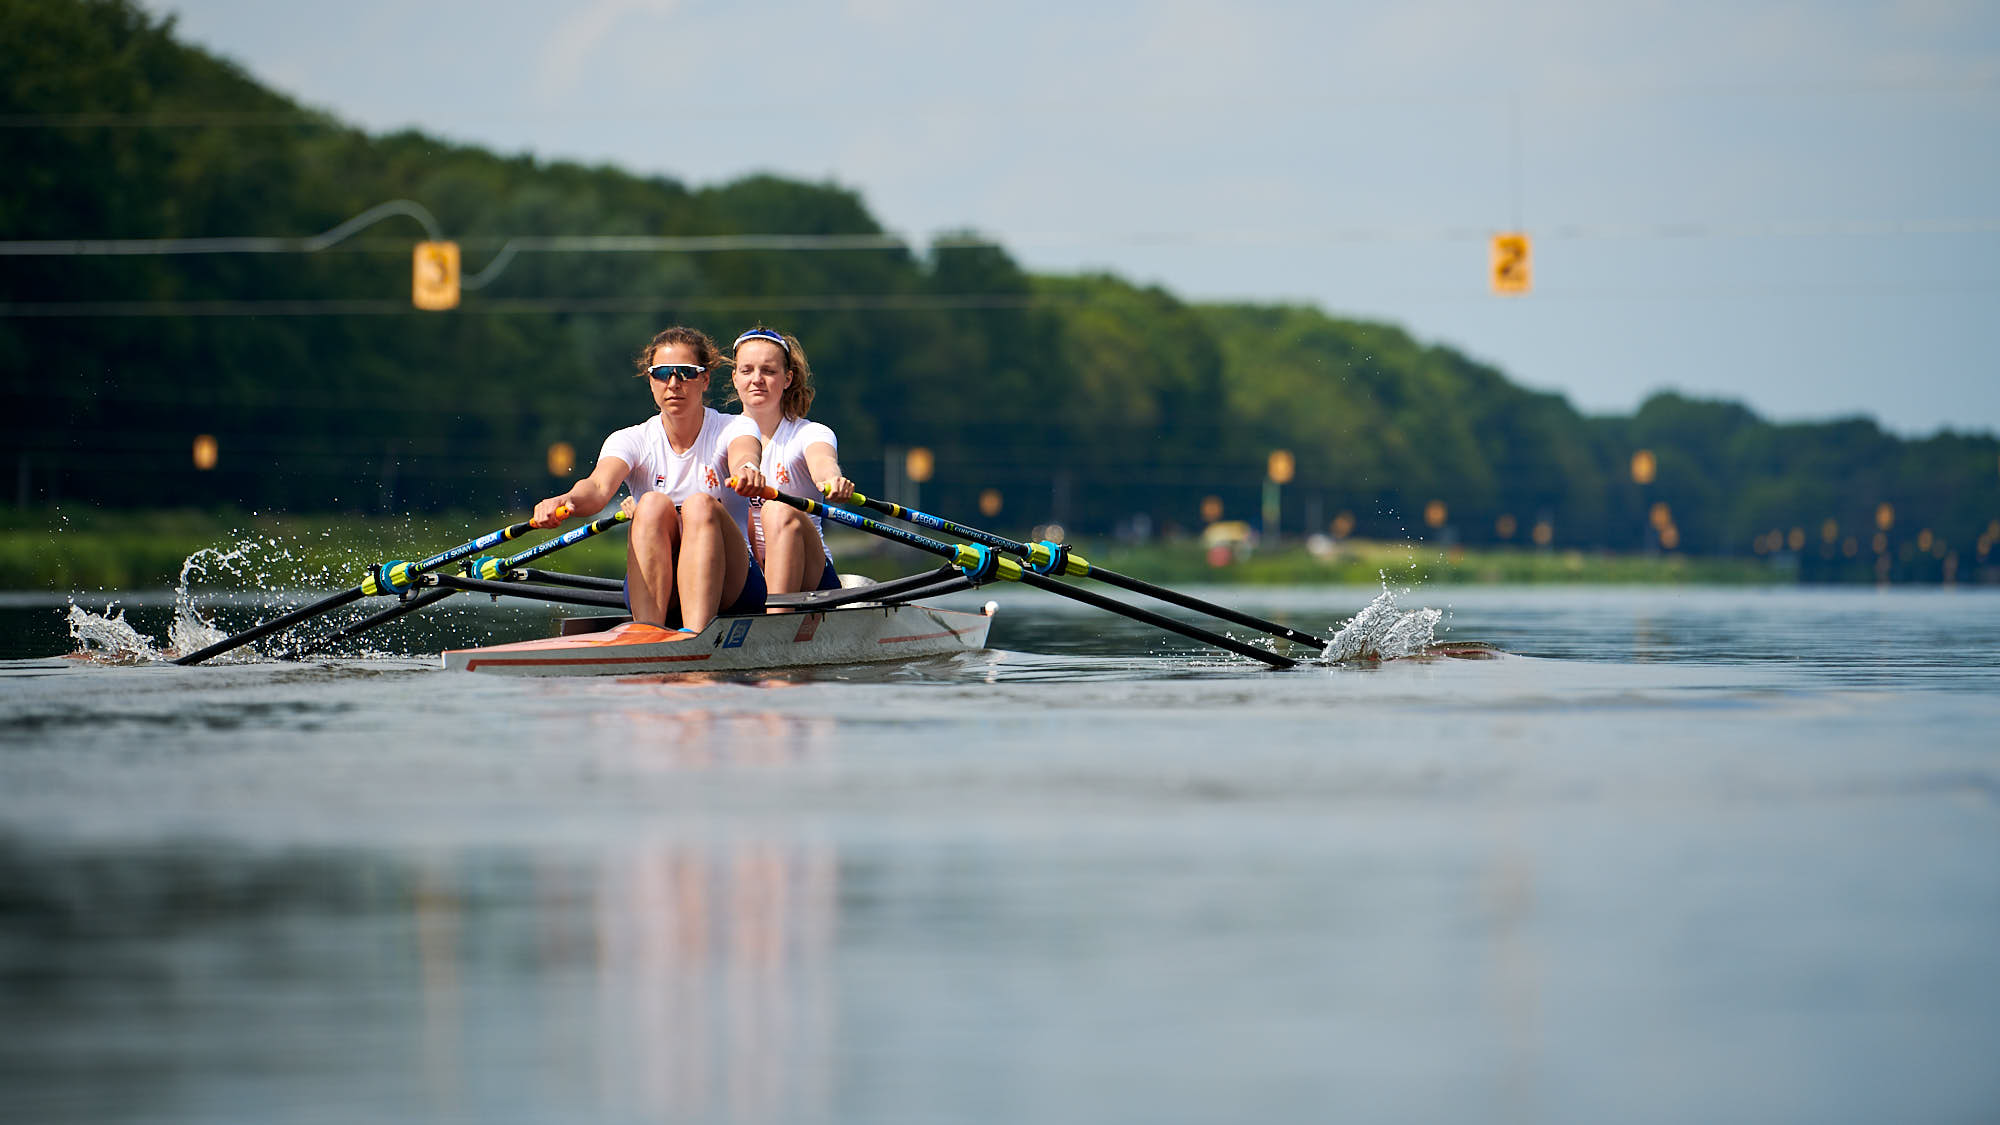 Ilse Paulis and Marieke Keijser rowing at the iconic Amsterdam Bosbaan